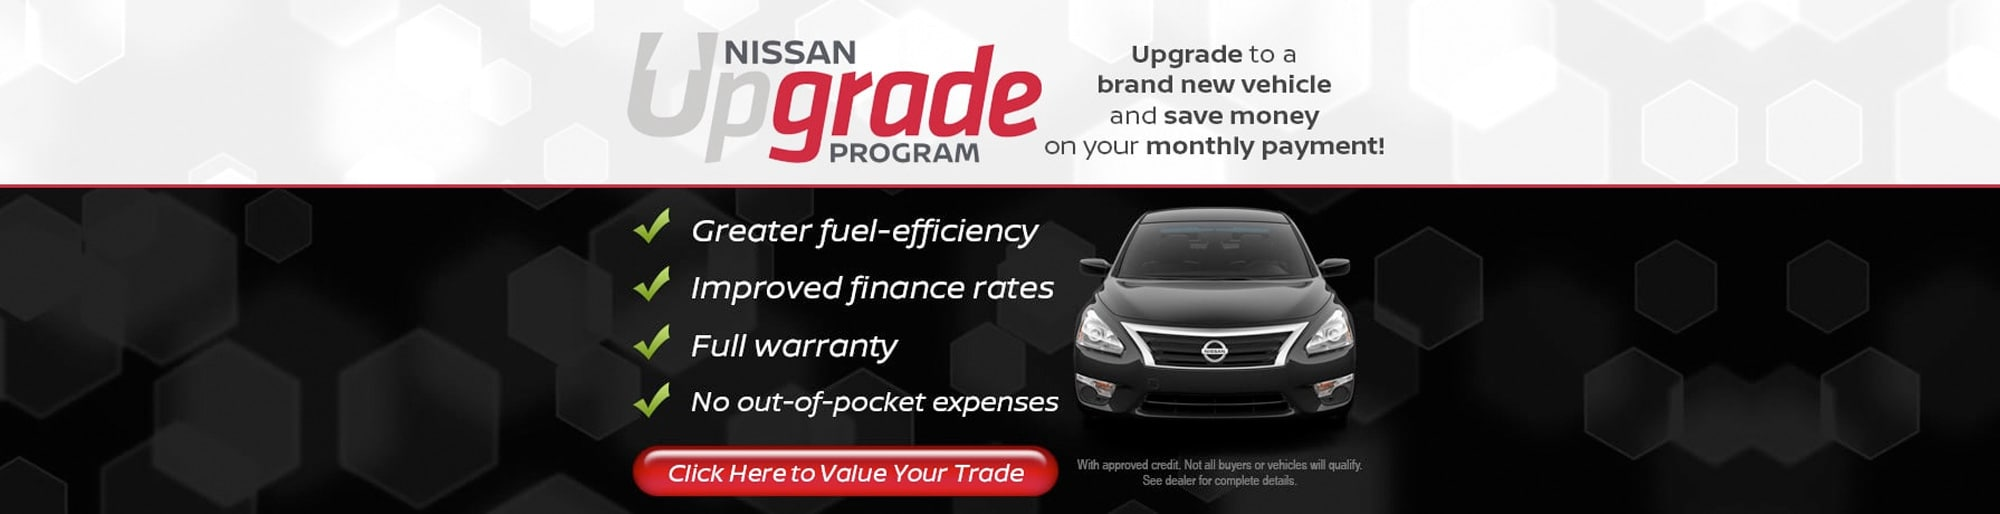 Nissan Dealer Johnson City TN | New & Used Car Dealership Serving ...